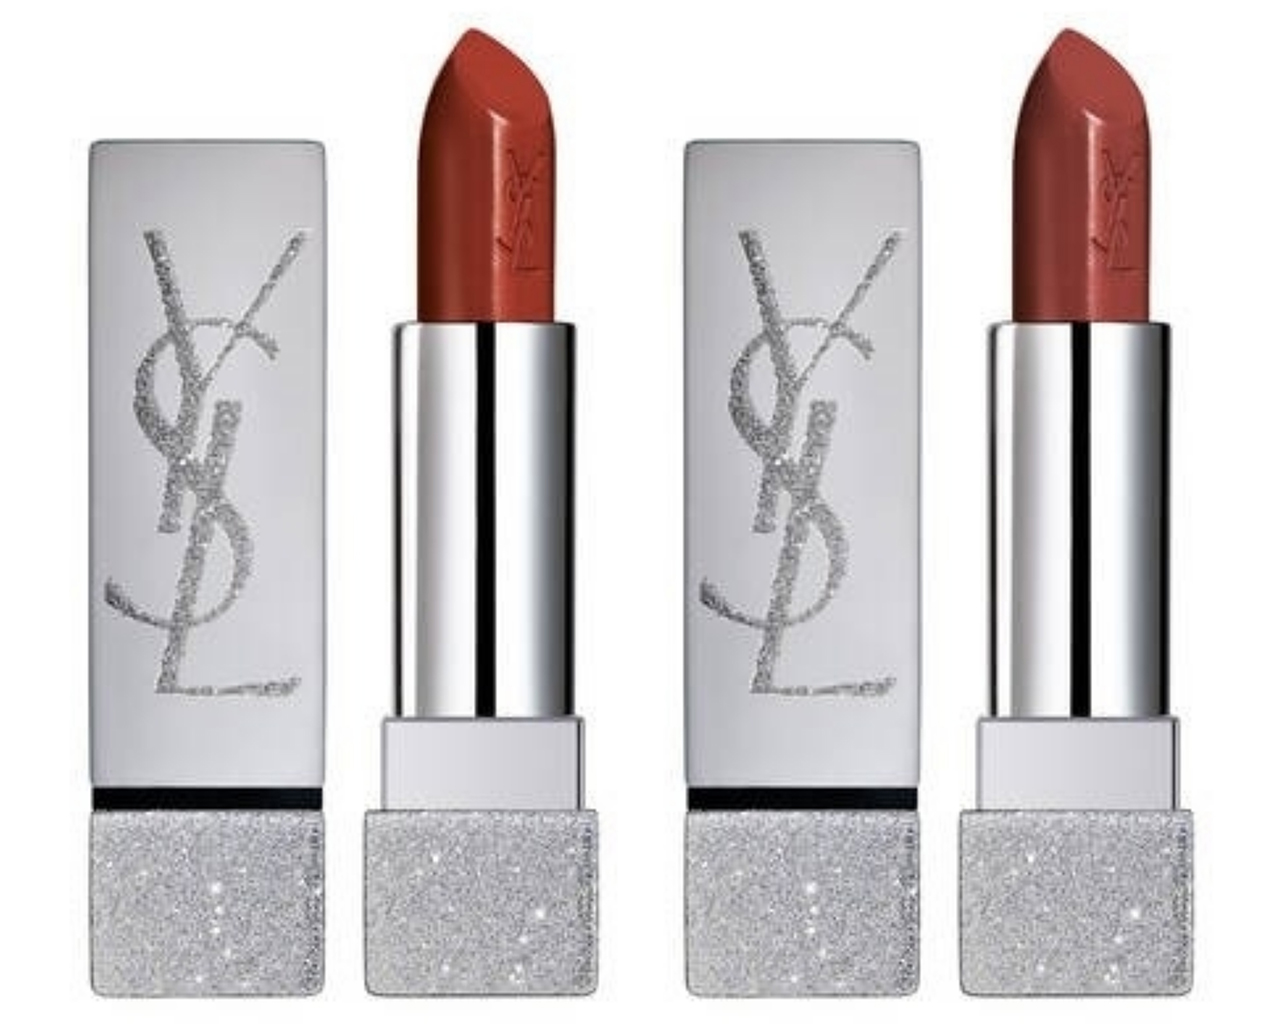 city-inspired lipstick